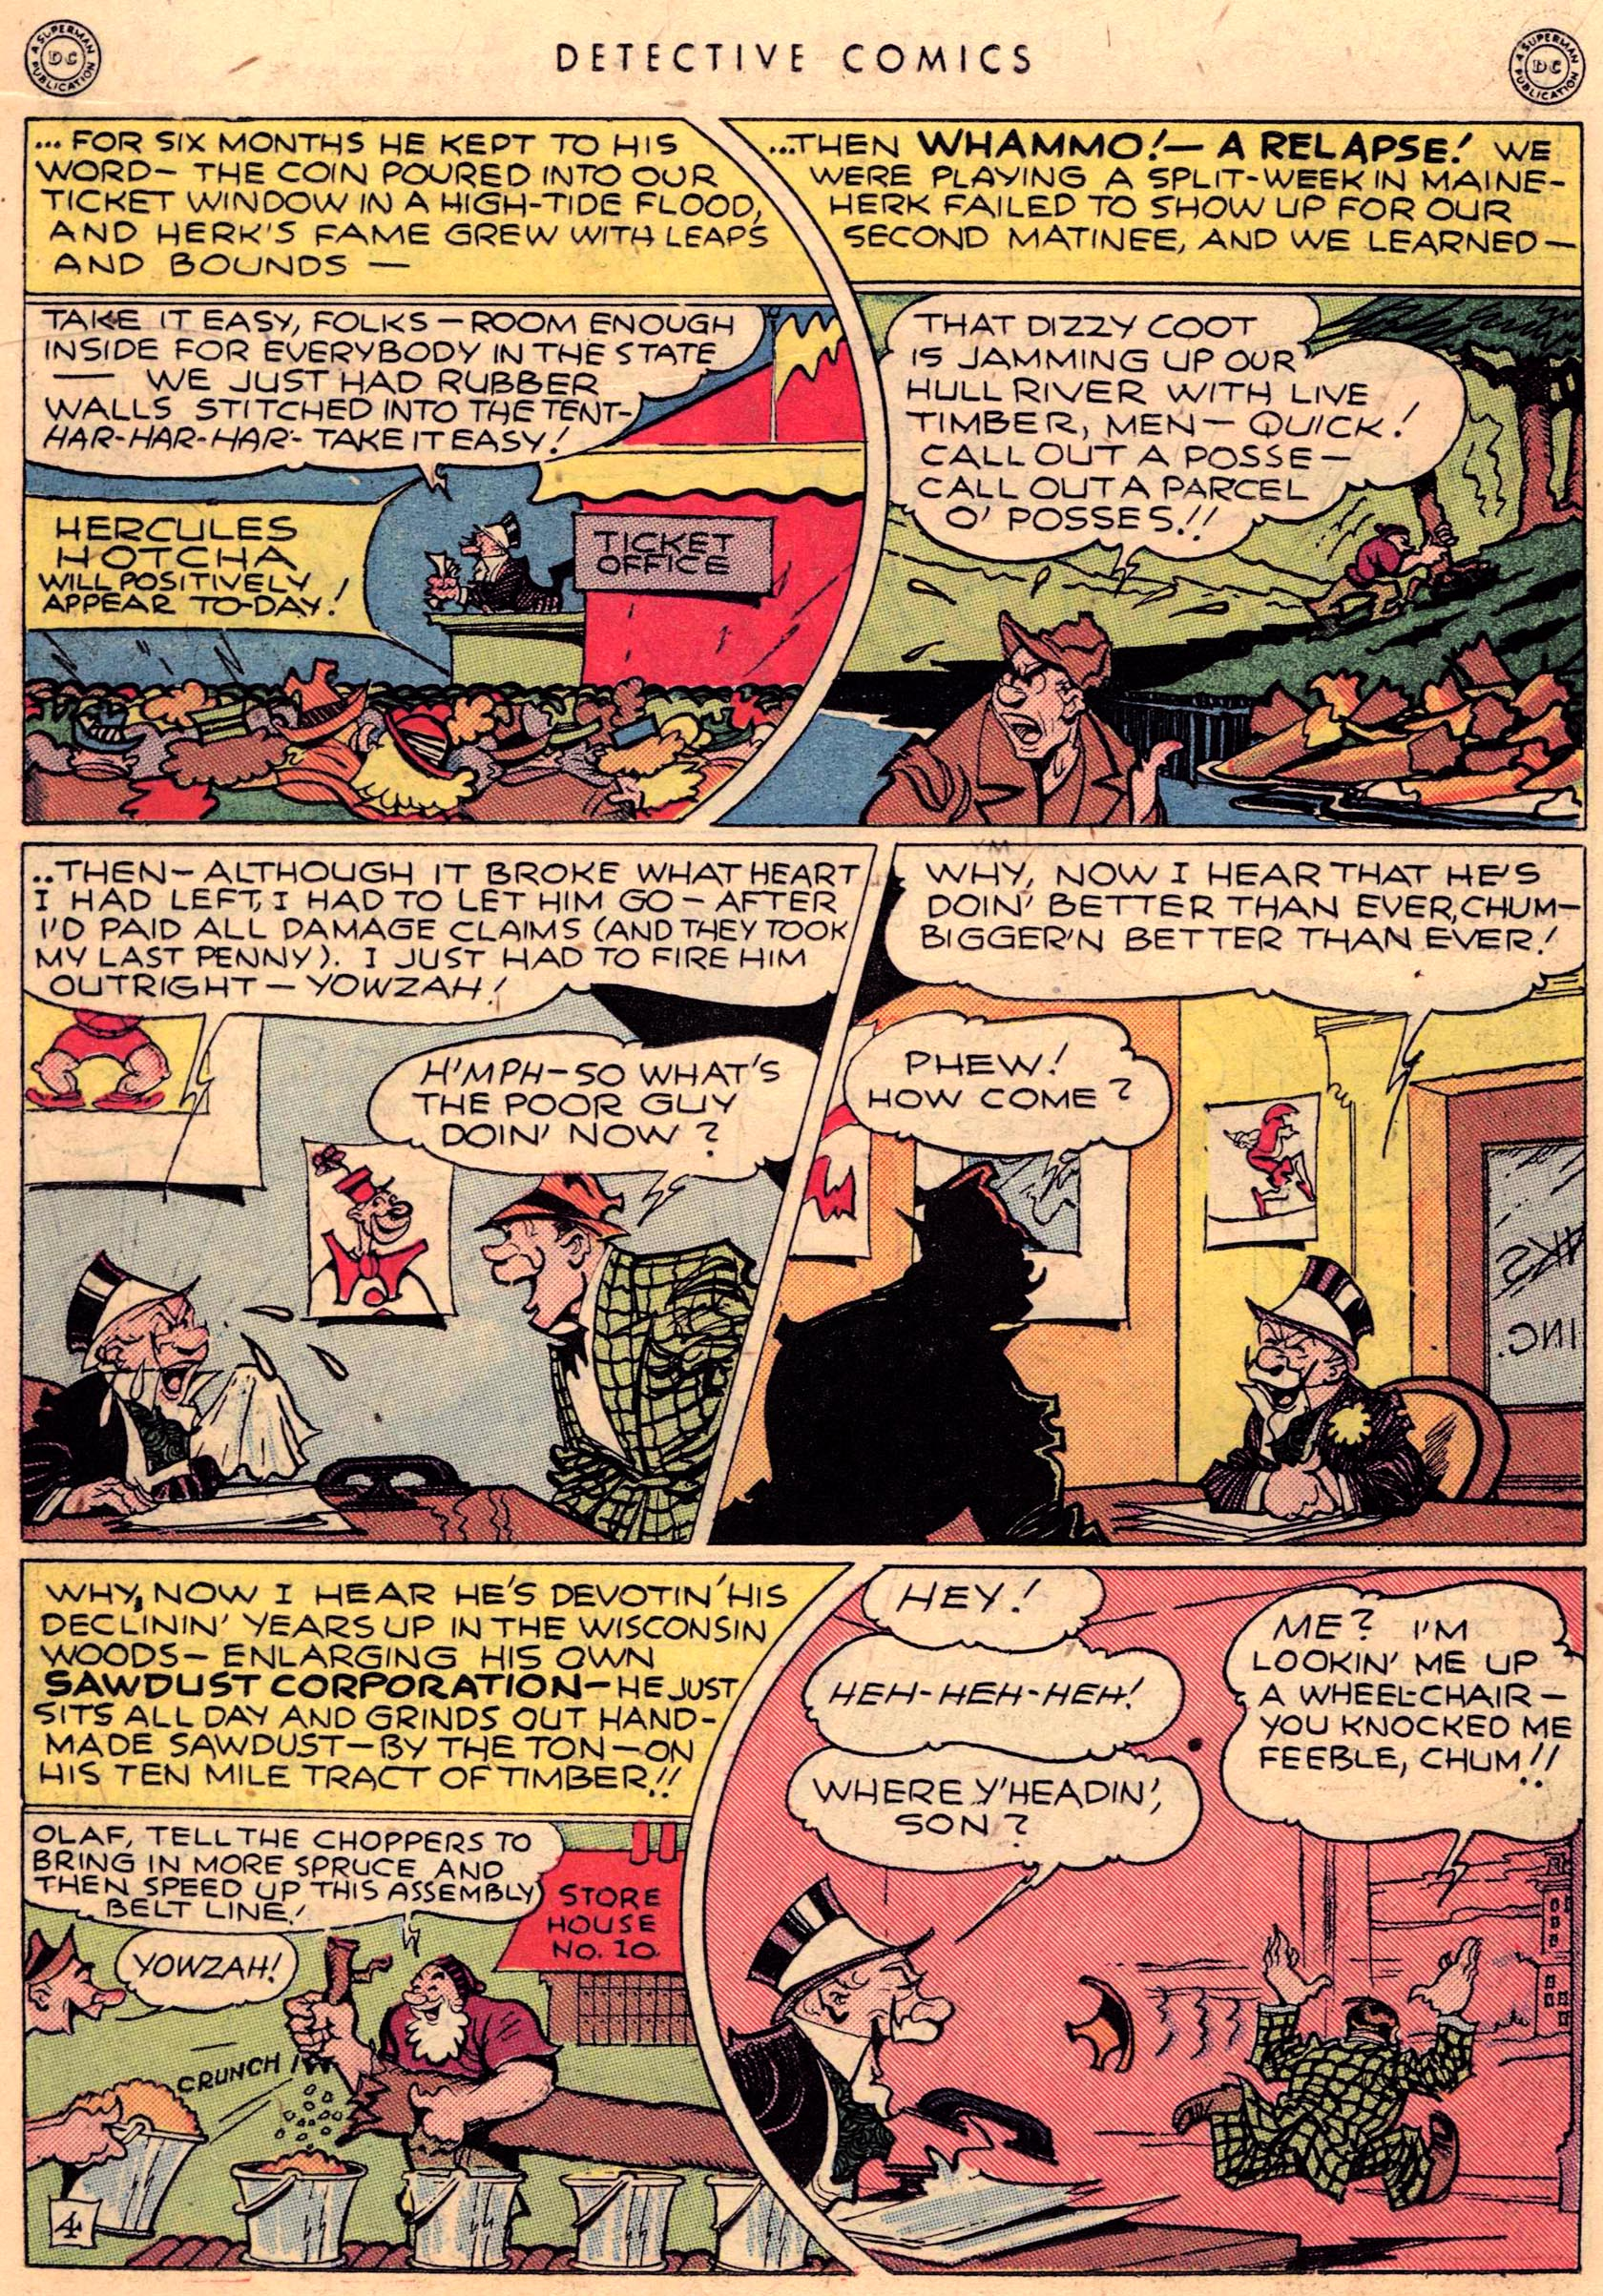 Read online Detective Comics (1937) comic -  Issue #95 - 20